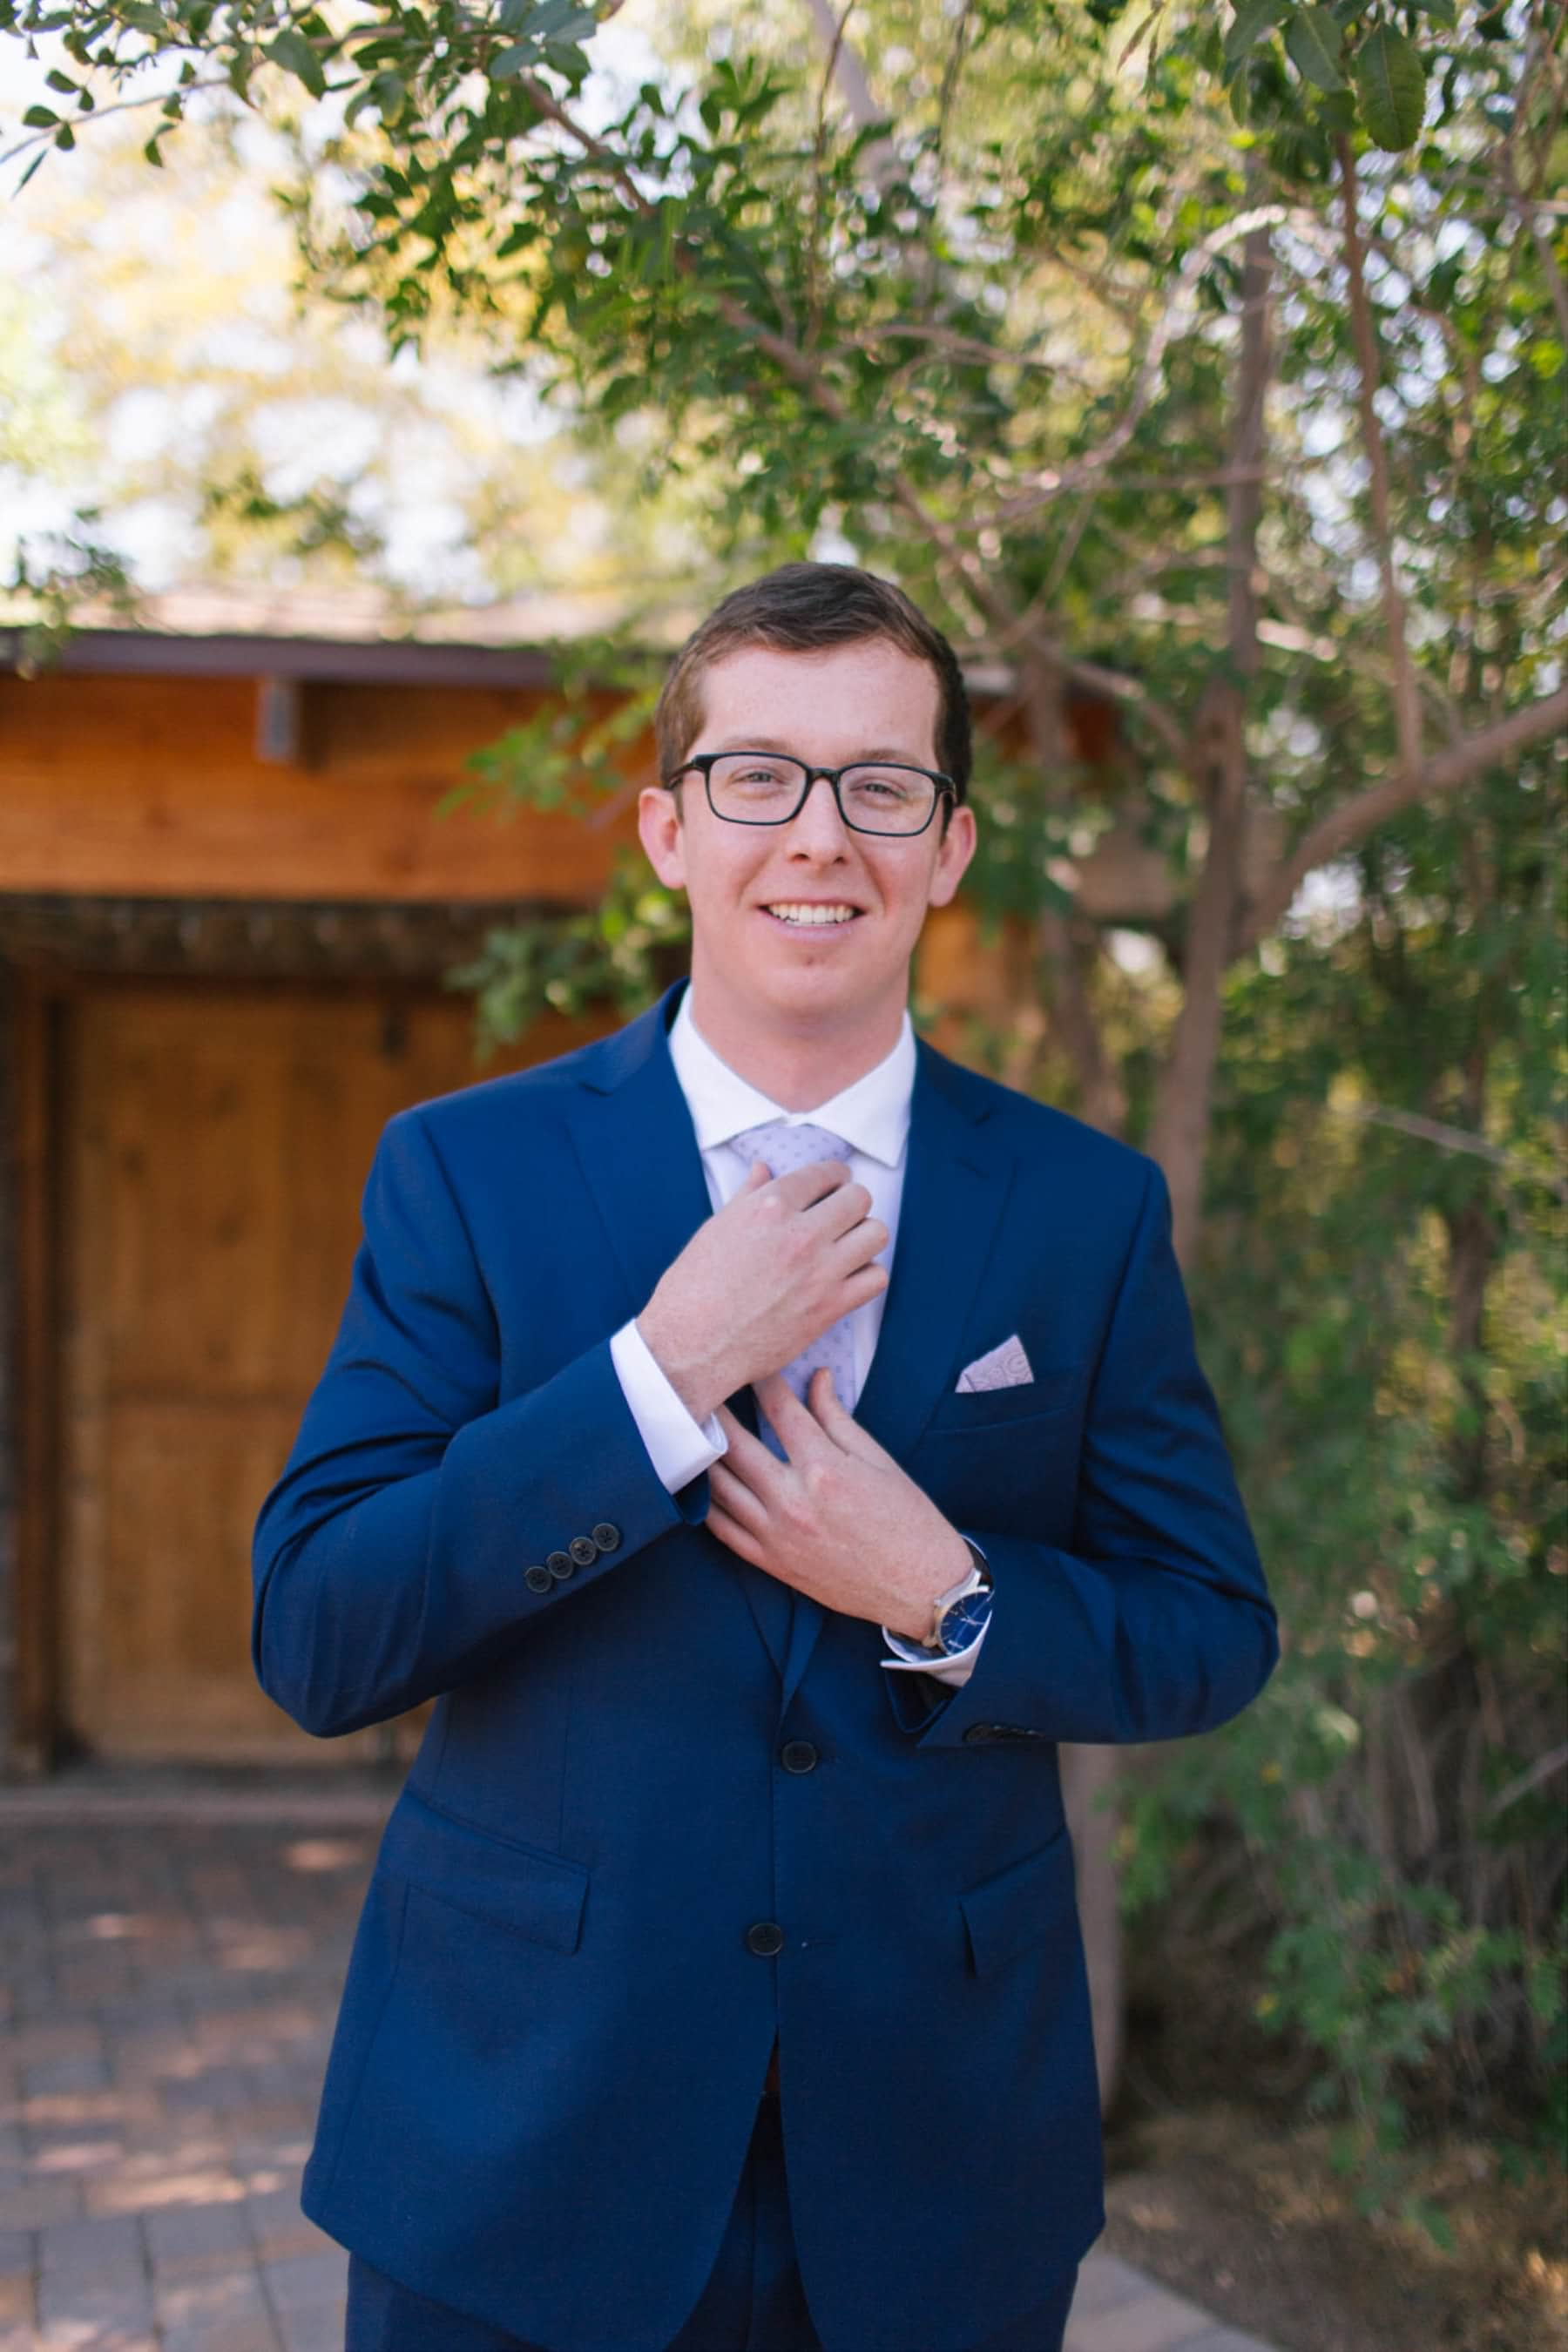 groom in blue suit at Phoenix Zoo wedding